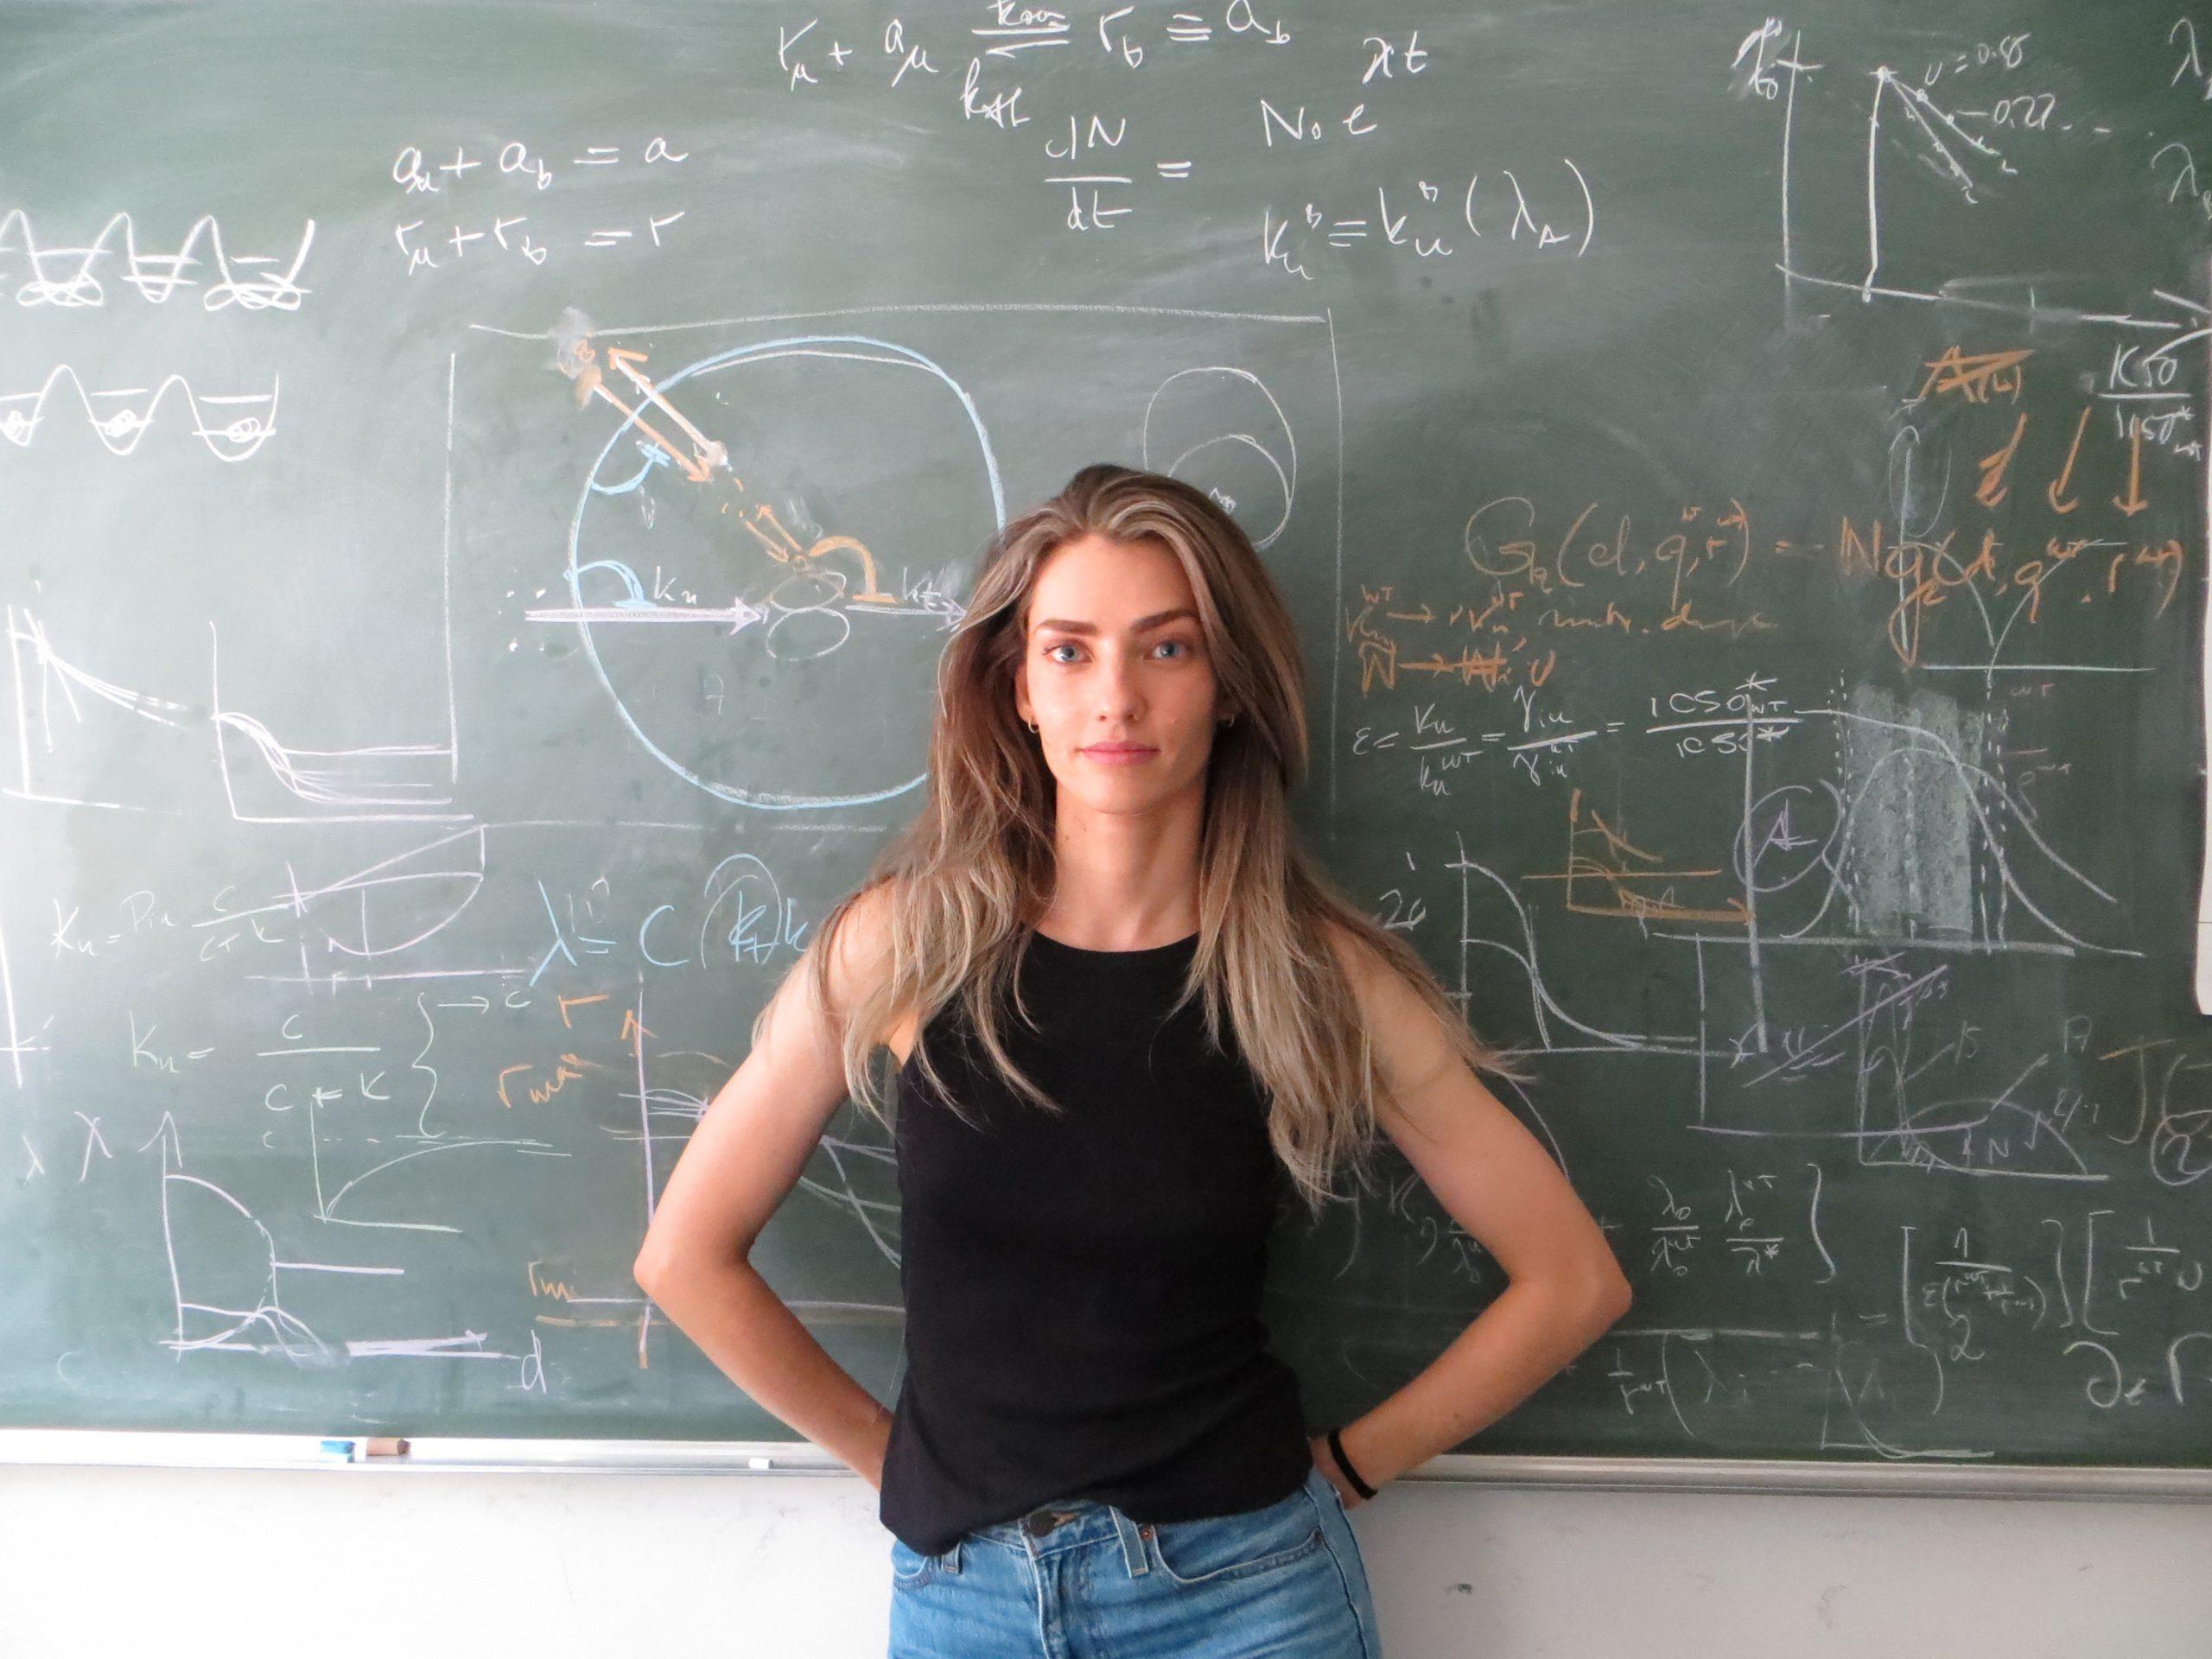 Introducing: Fernanda Pinheiro